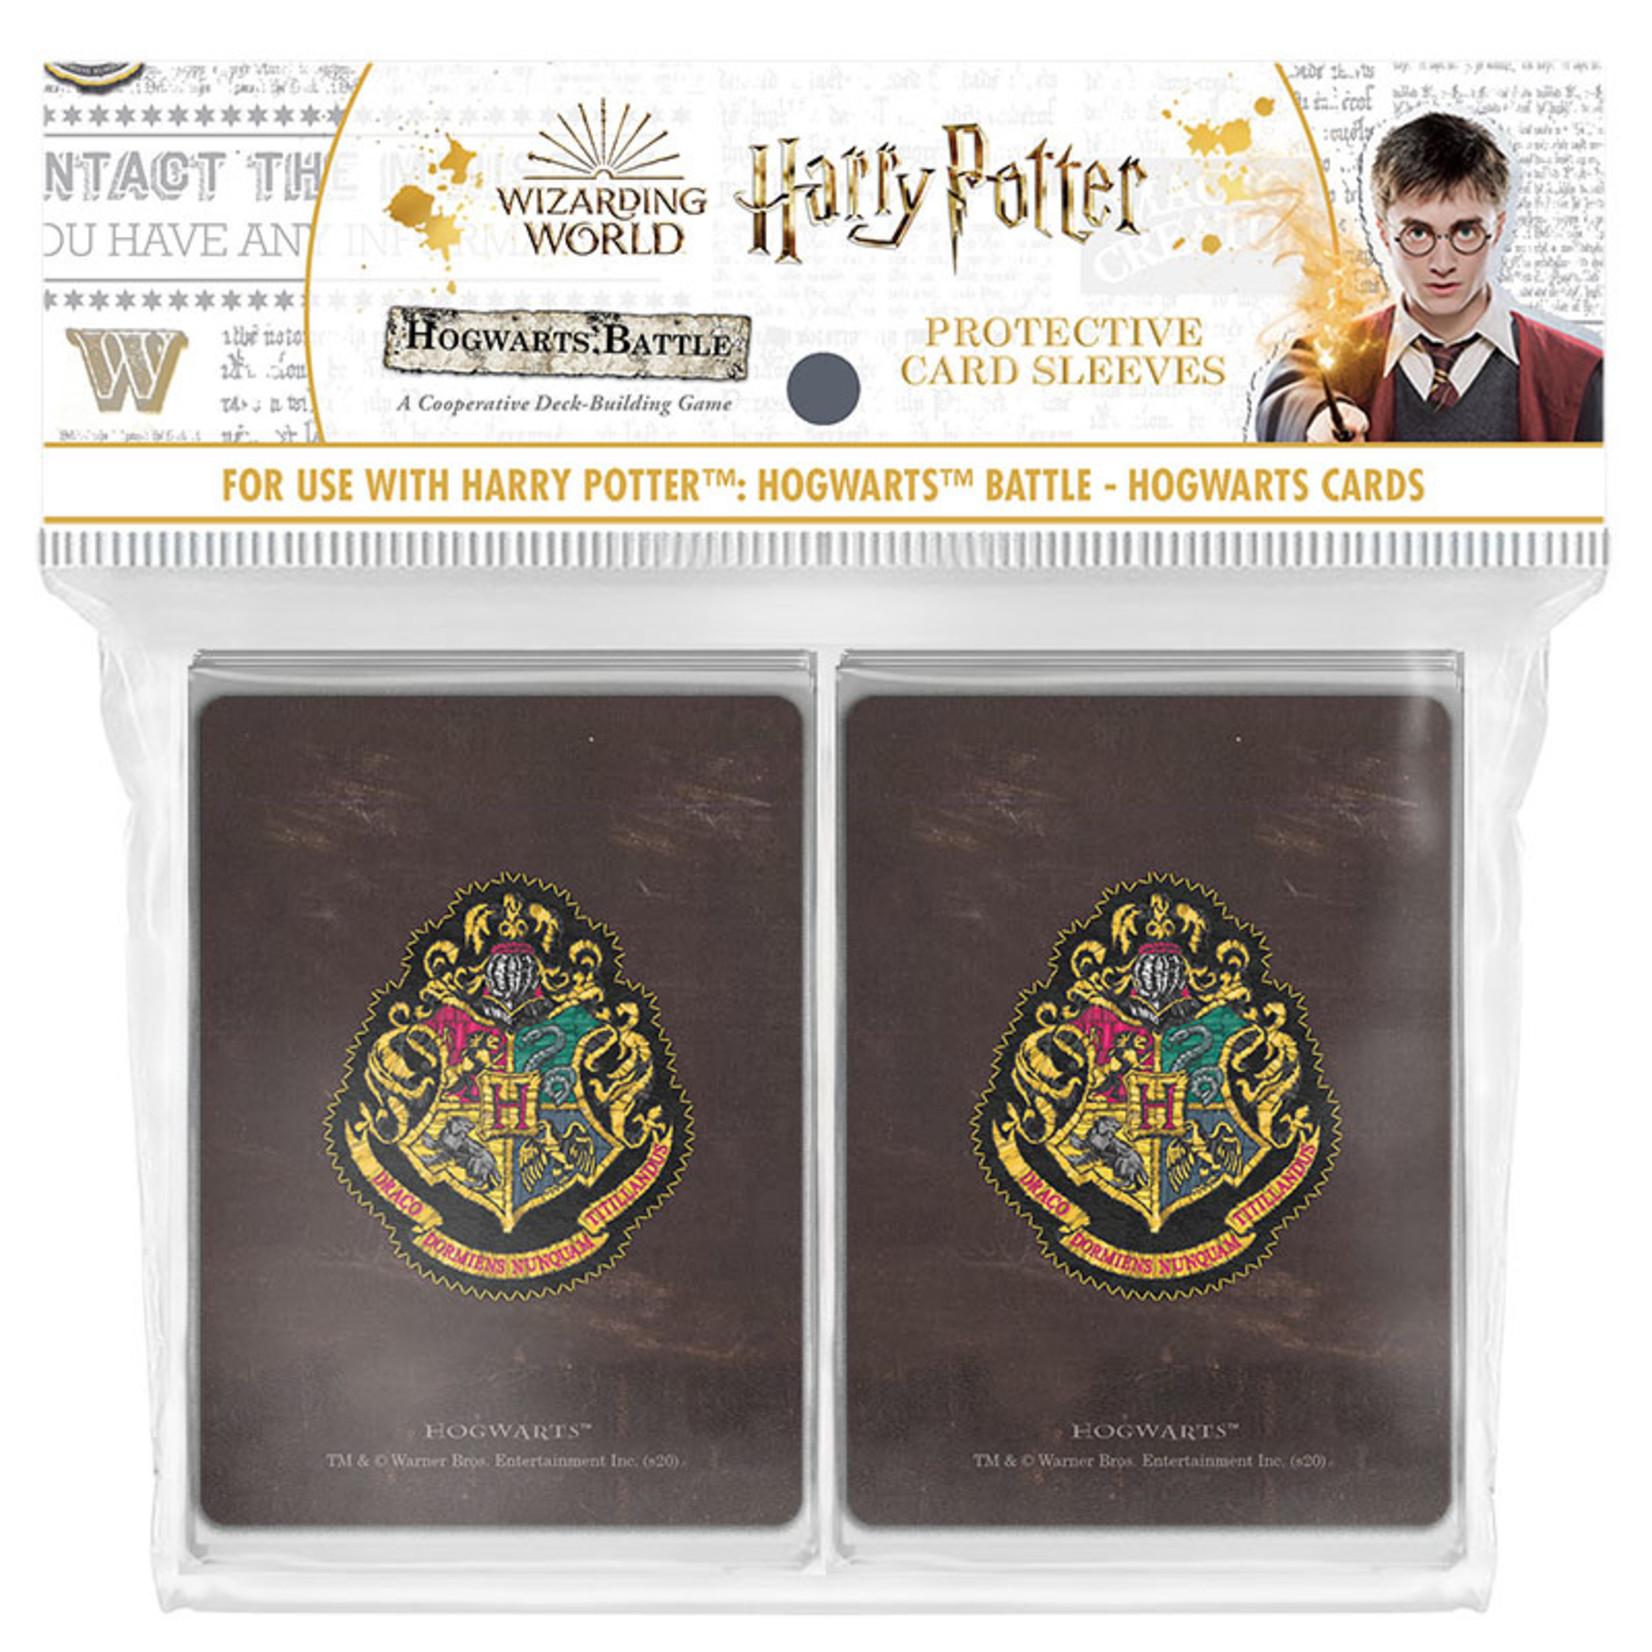 USAoploy Harry Potter Hogwarts Battle Card Sleeves